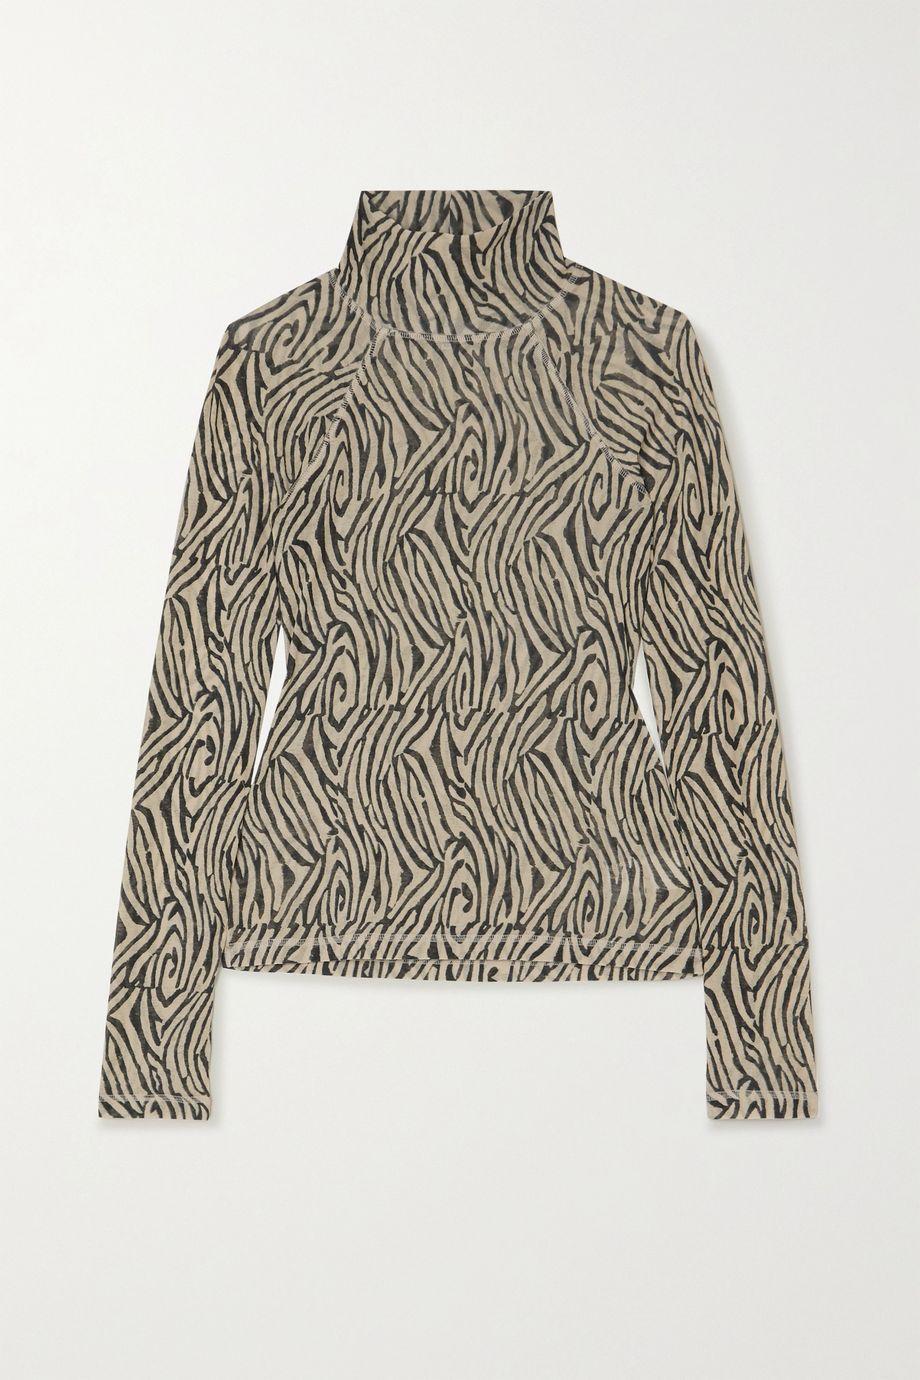 Nanushka Madi 斑马纹平纹布高领上衣